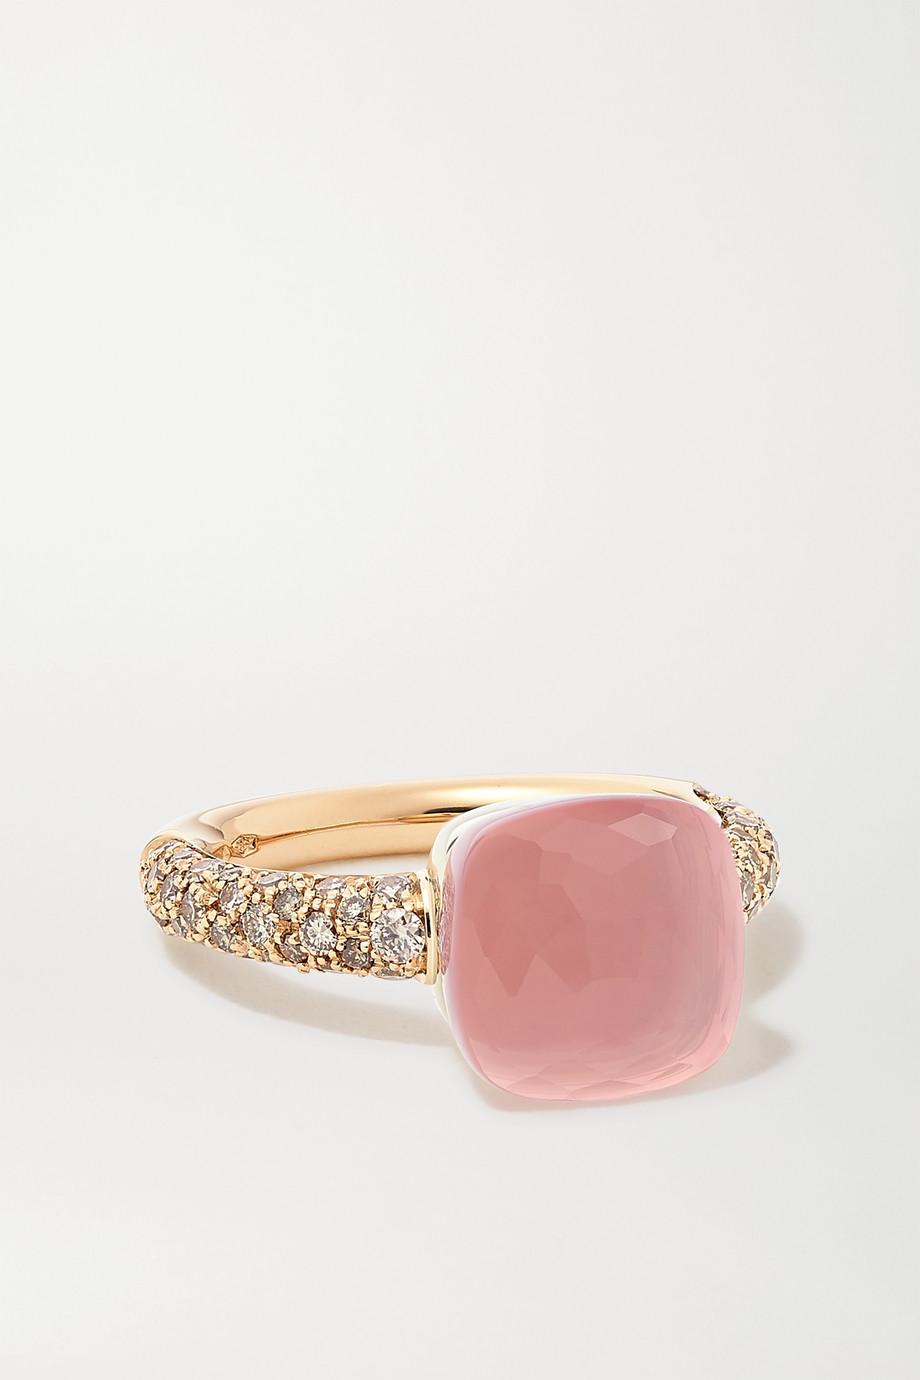 Pomellato Nudo Classic 18-karat white and rose gold multi-stone ring